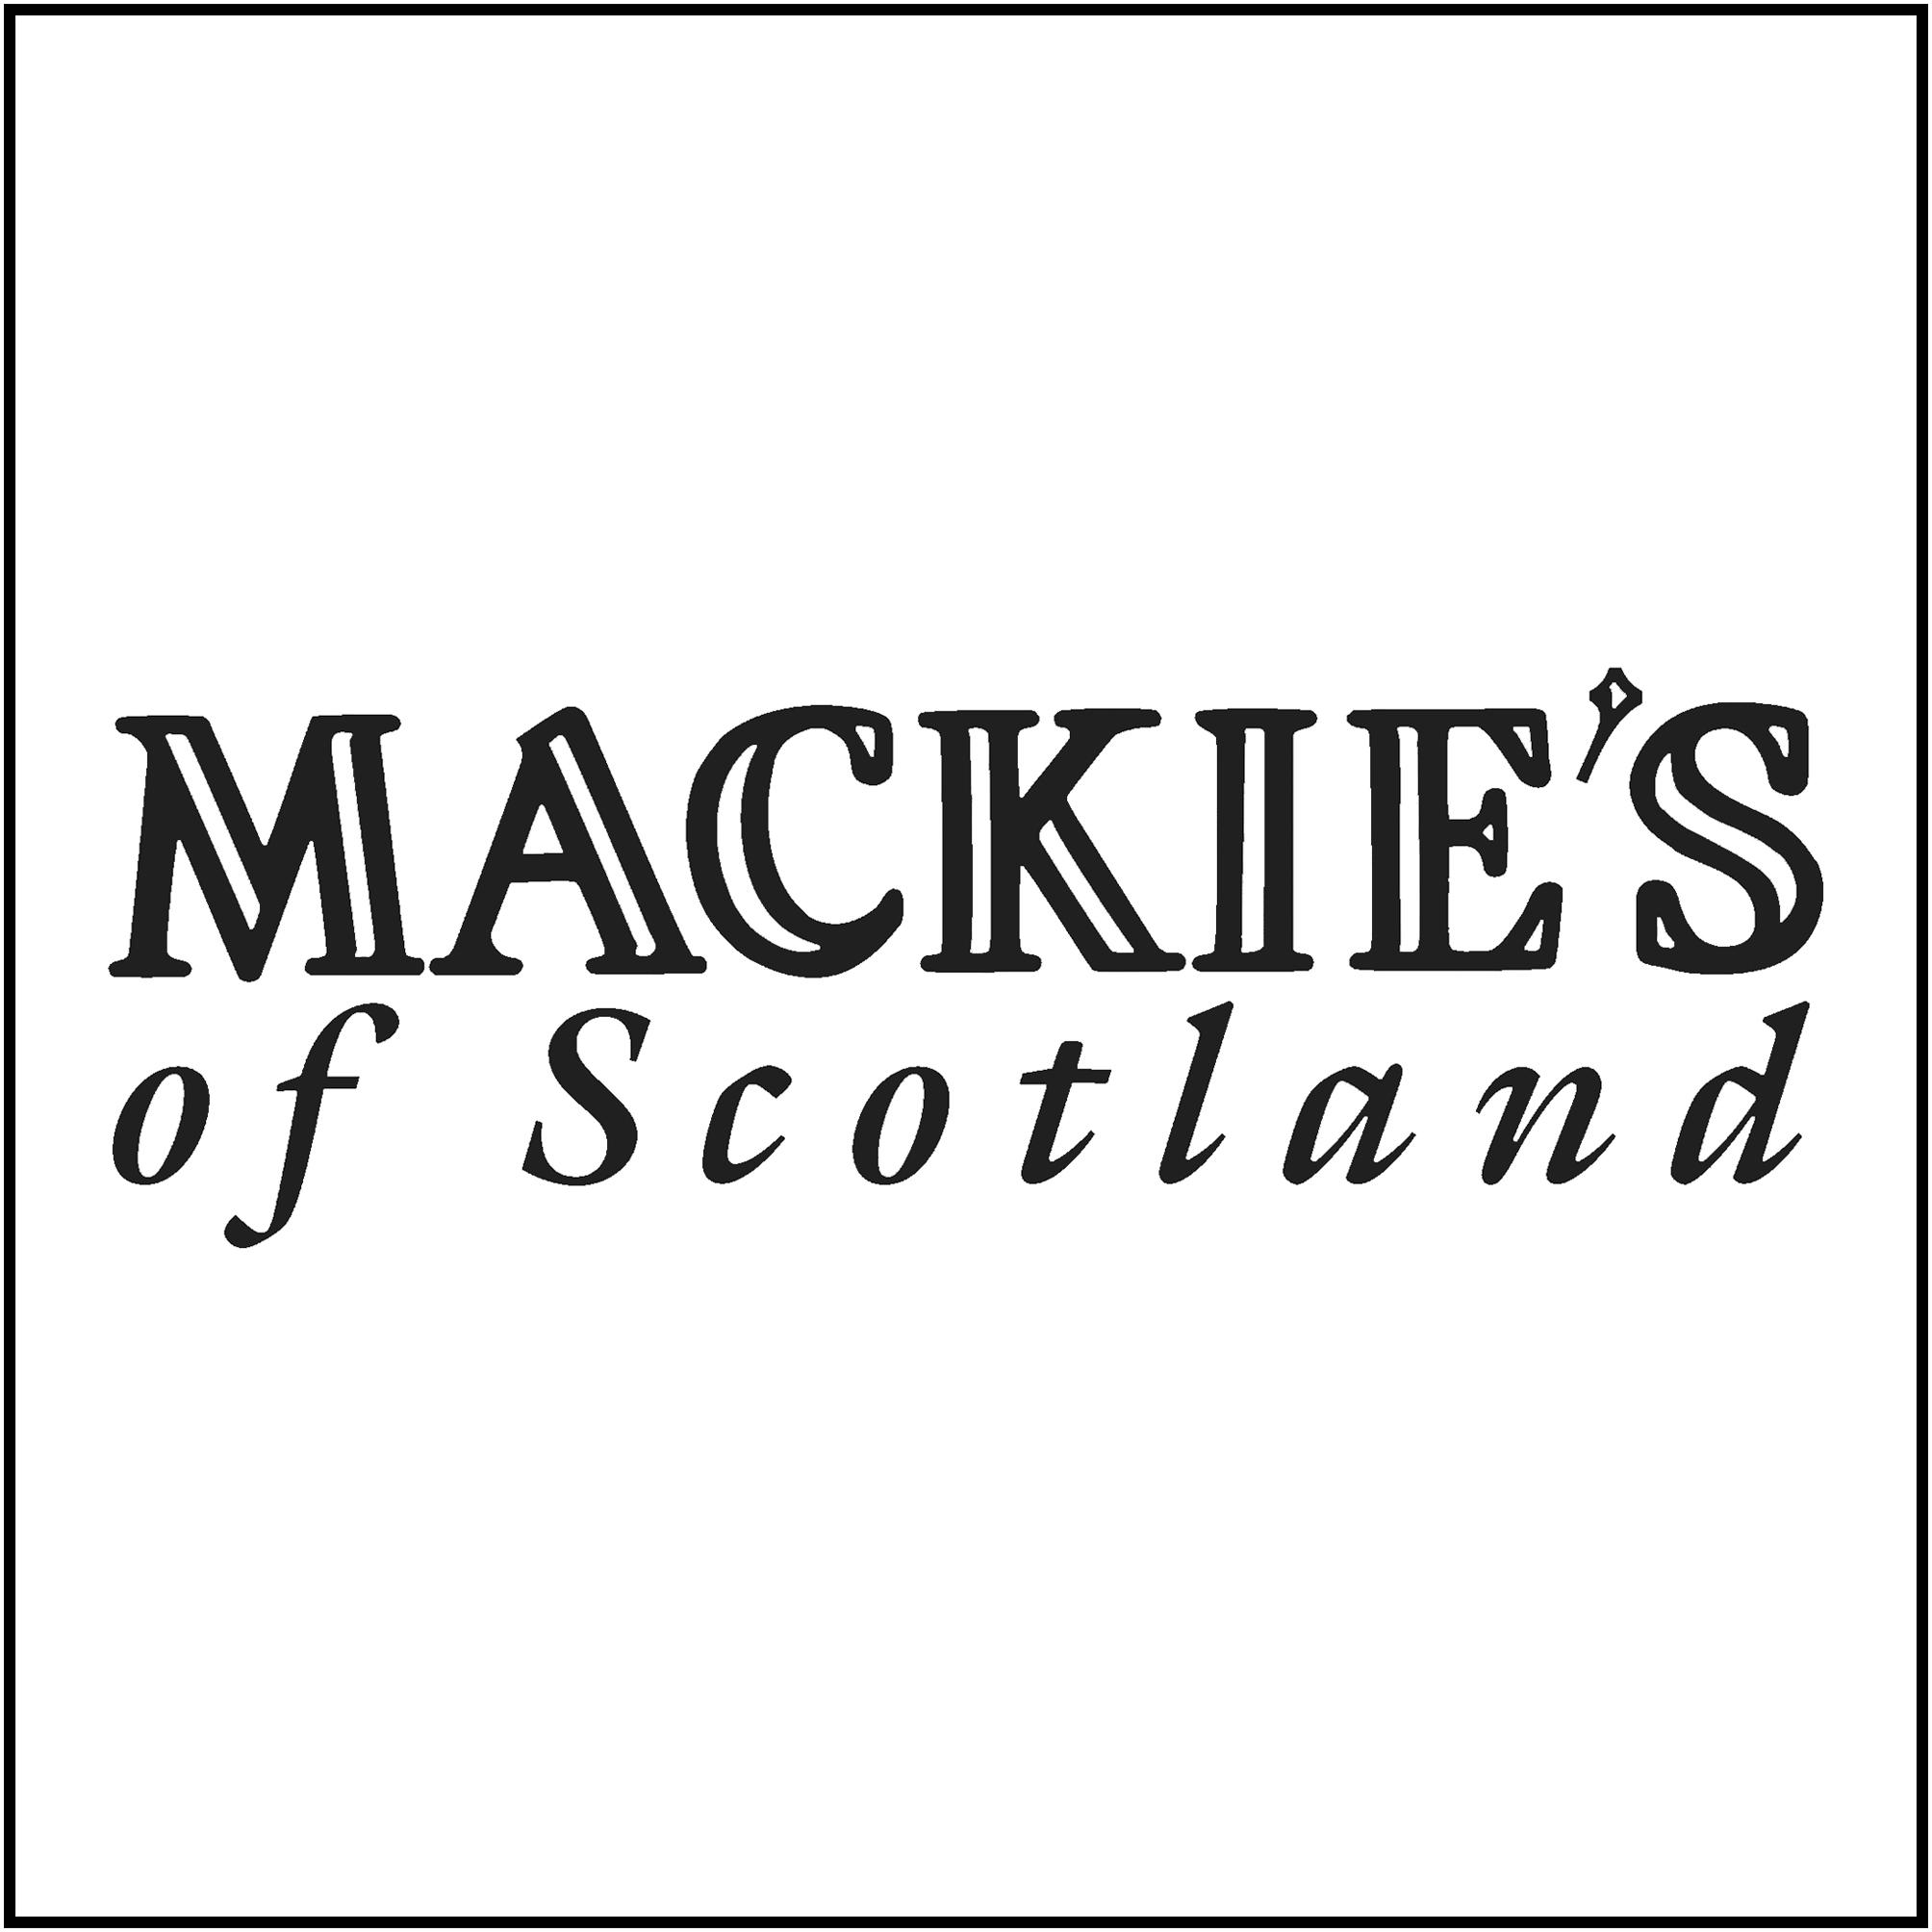 Mackies logo